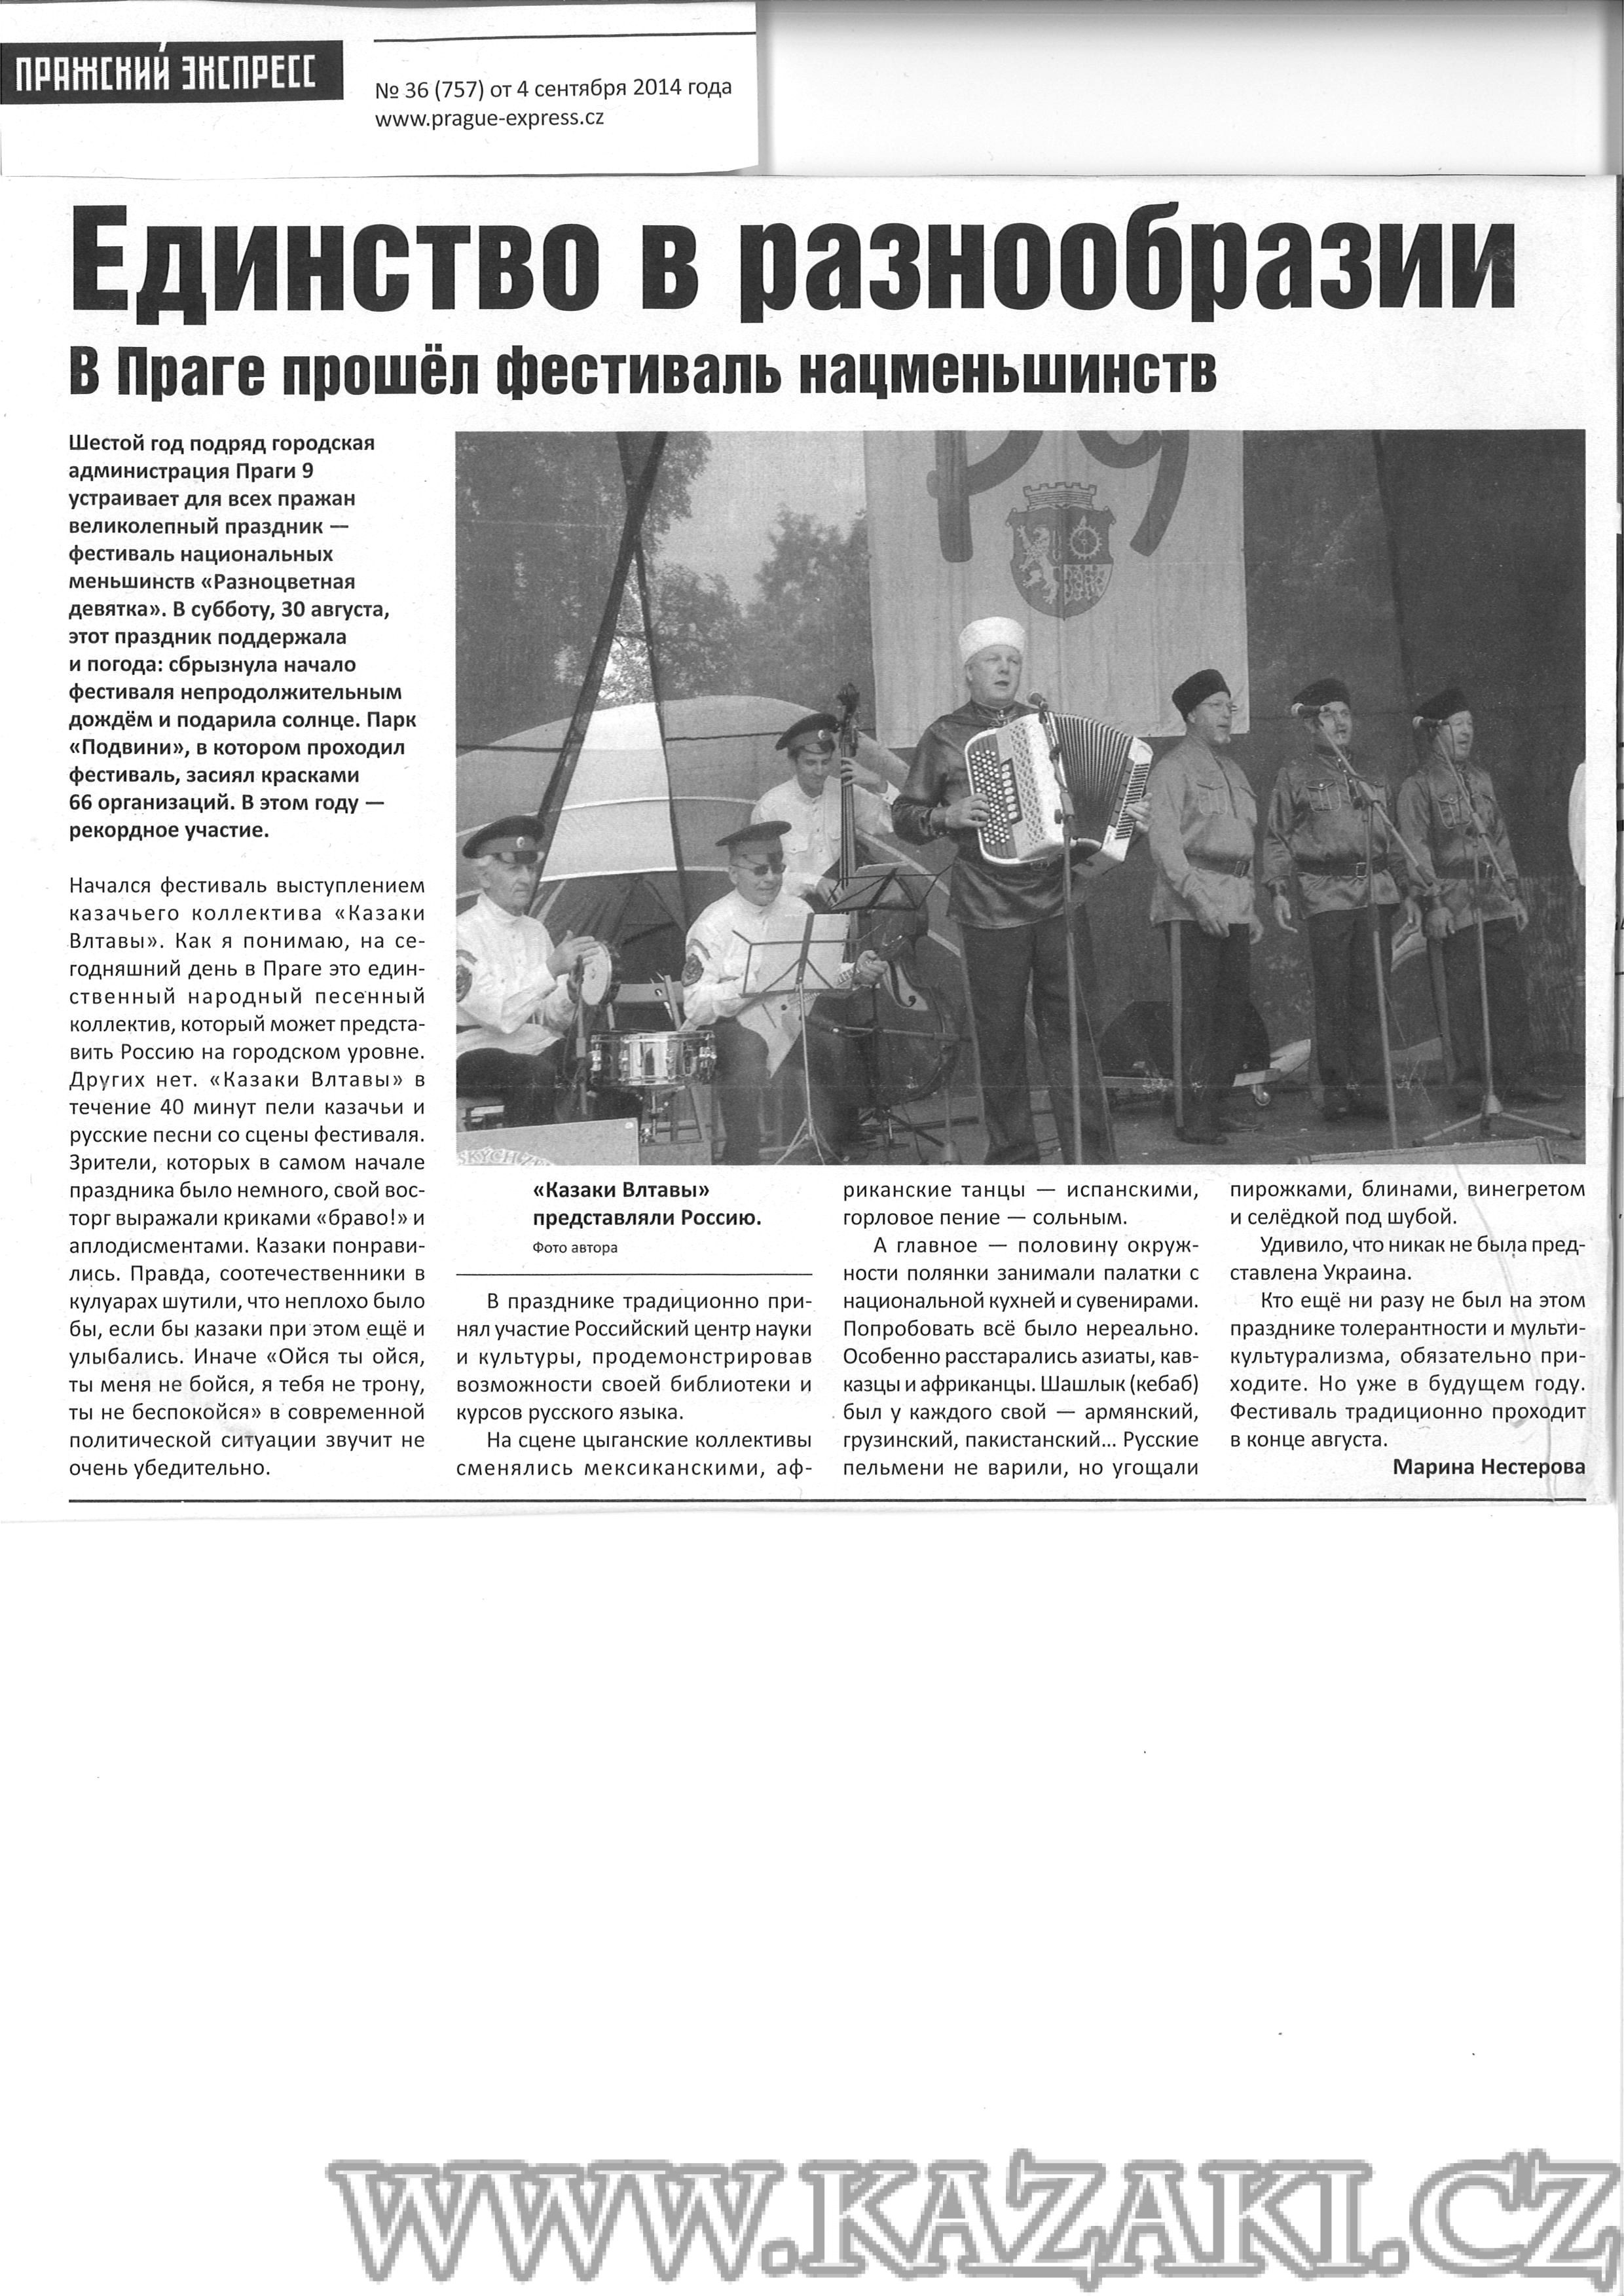 20140904_Prazsky-express-c36_Jedinstvo-v-raznoobrazii_001